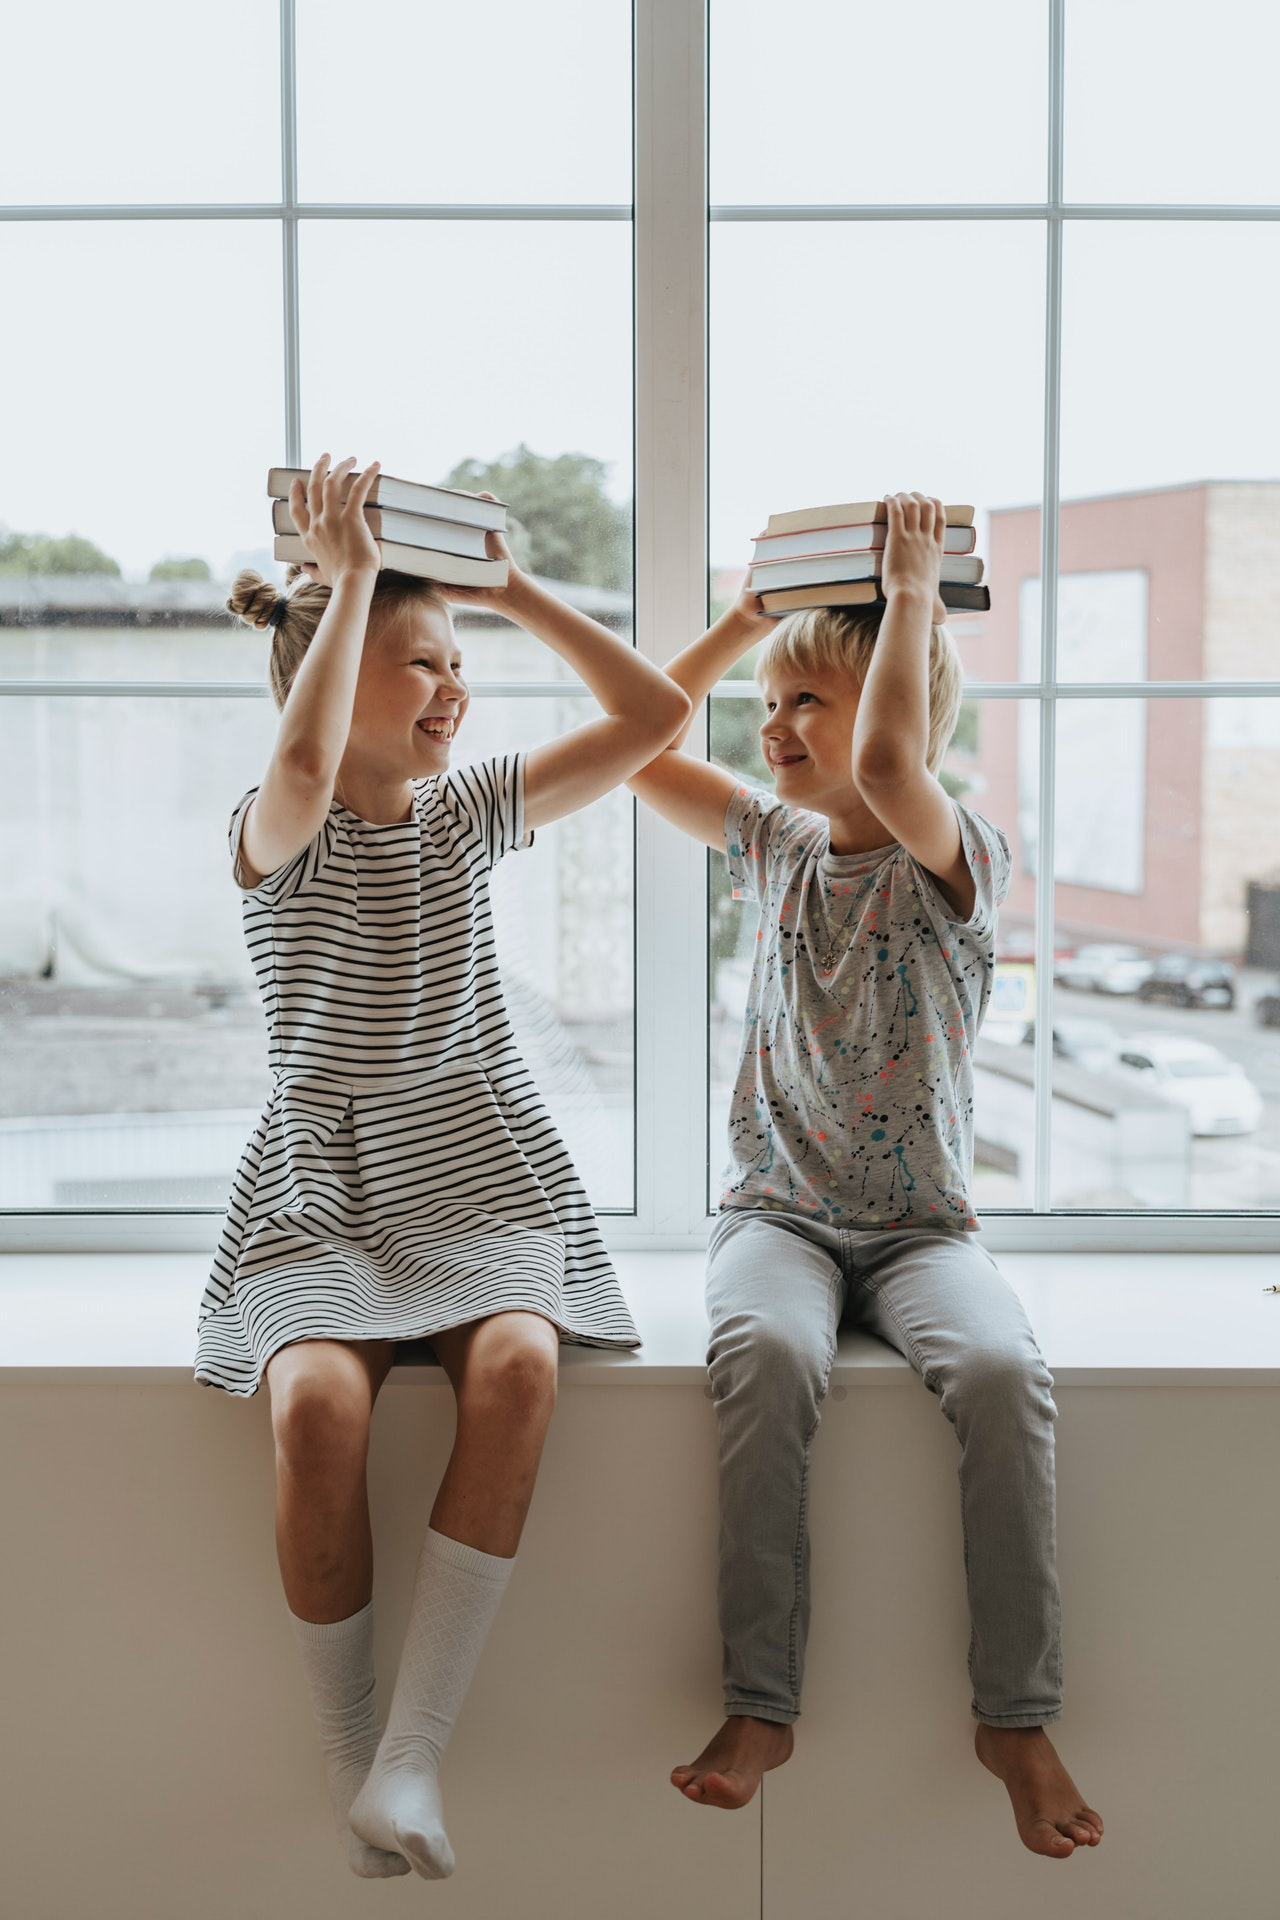 https://smorgasbordinvitation.wordpress.com/2021/07/15/smorgasbord-childrens-reading-room-change-language-whaaat-by-dawn-doig/